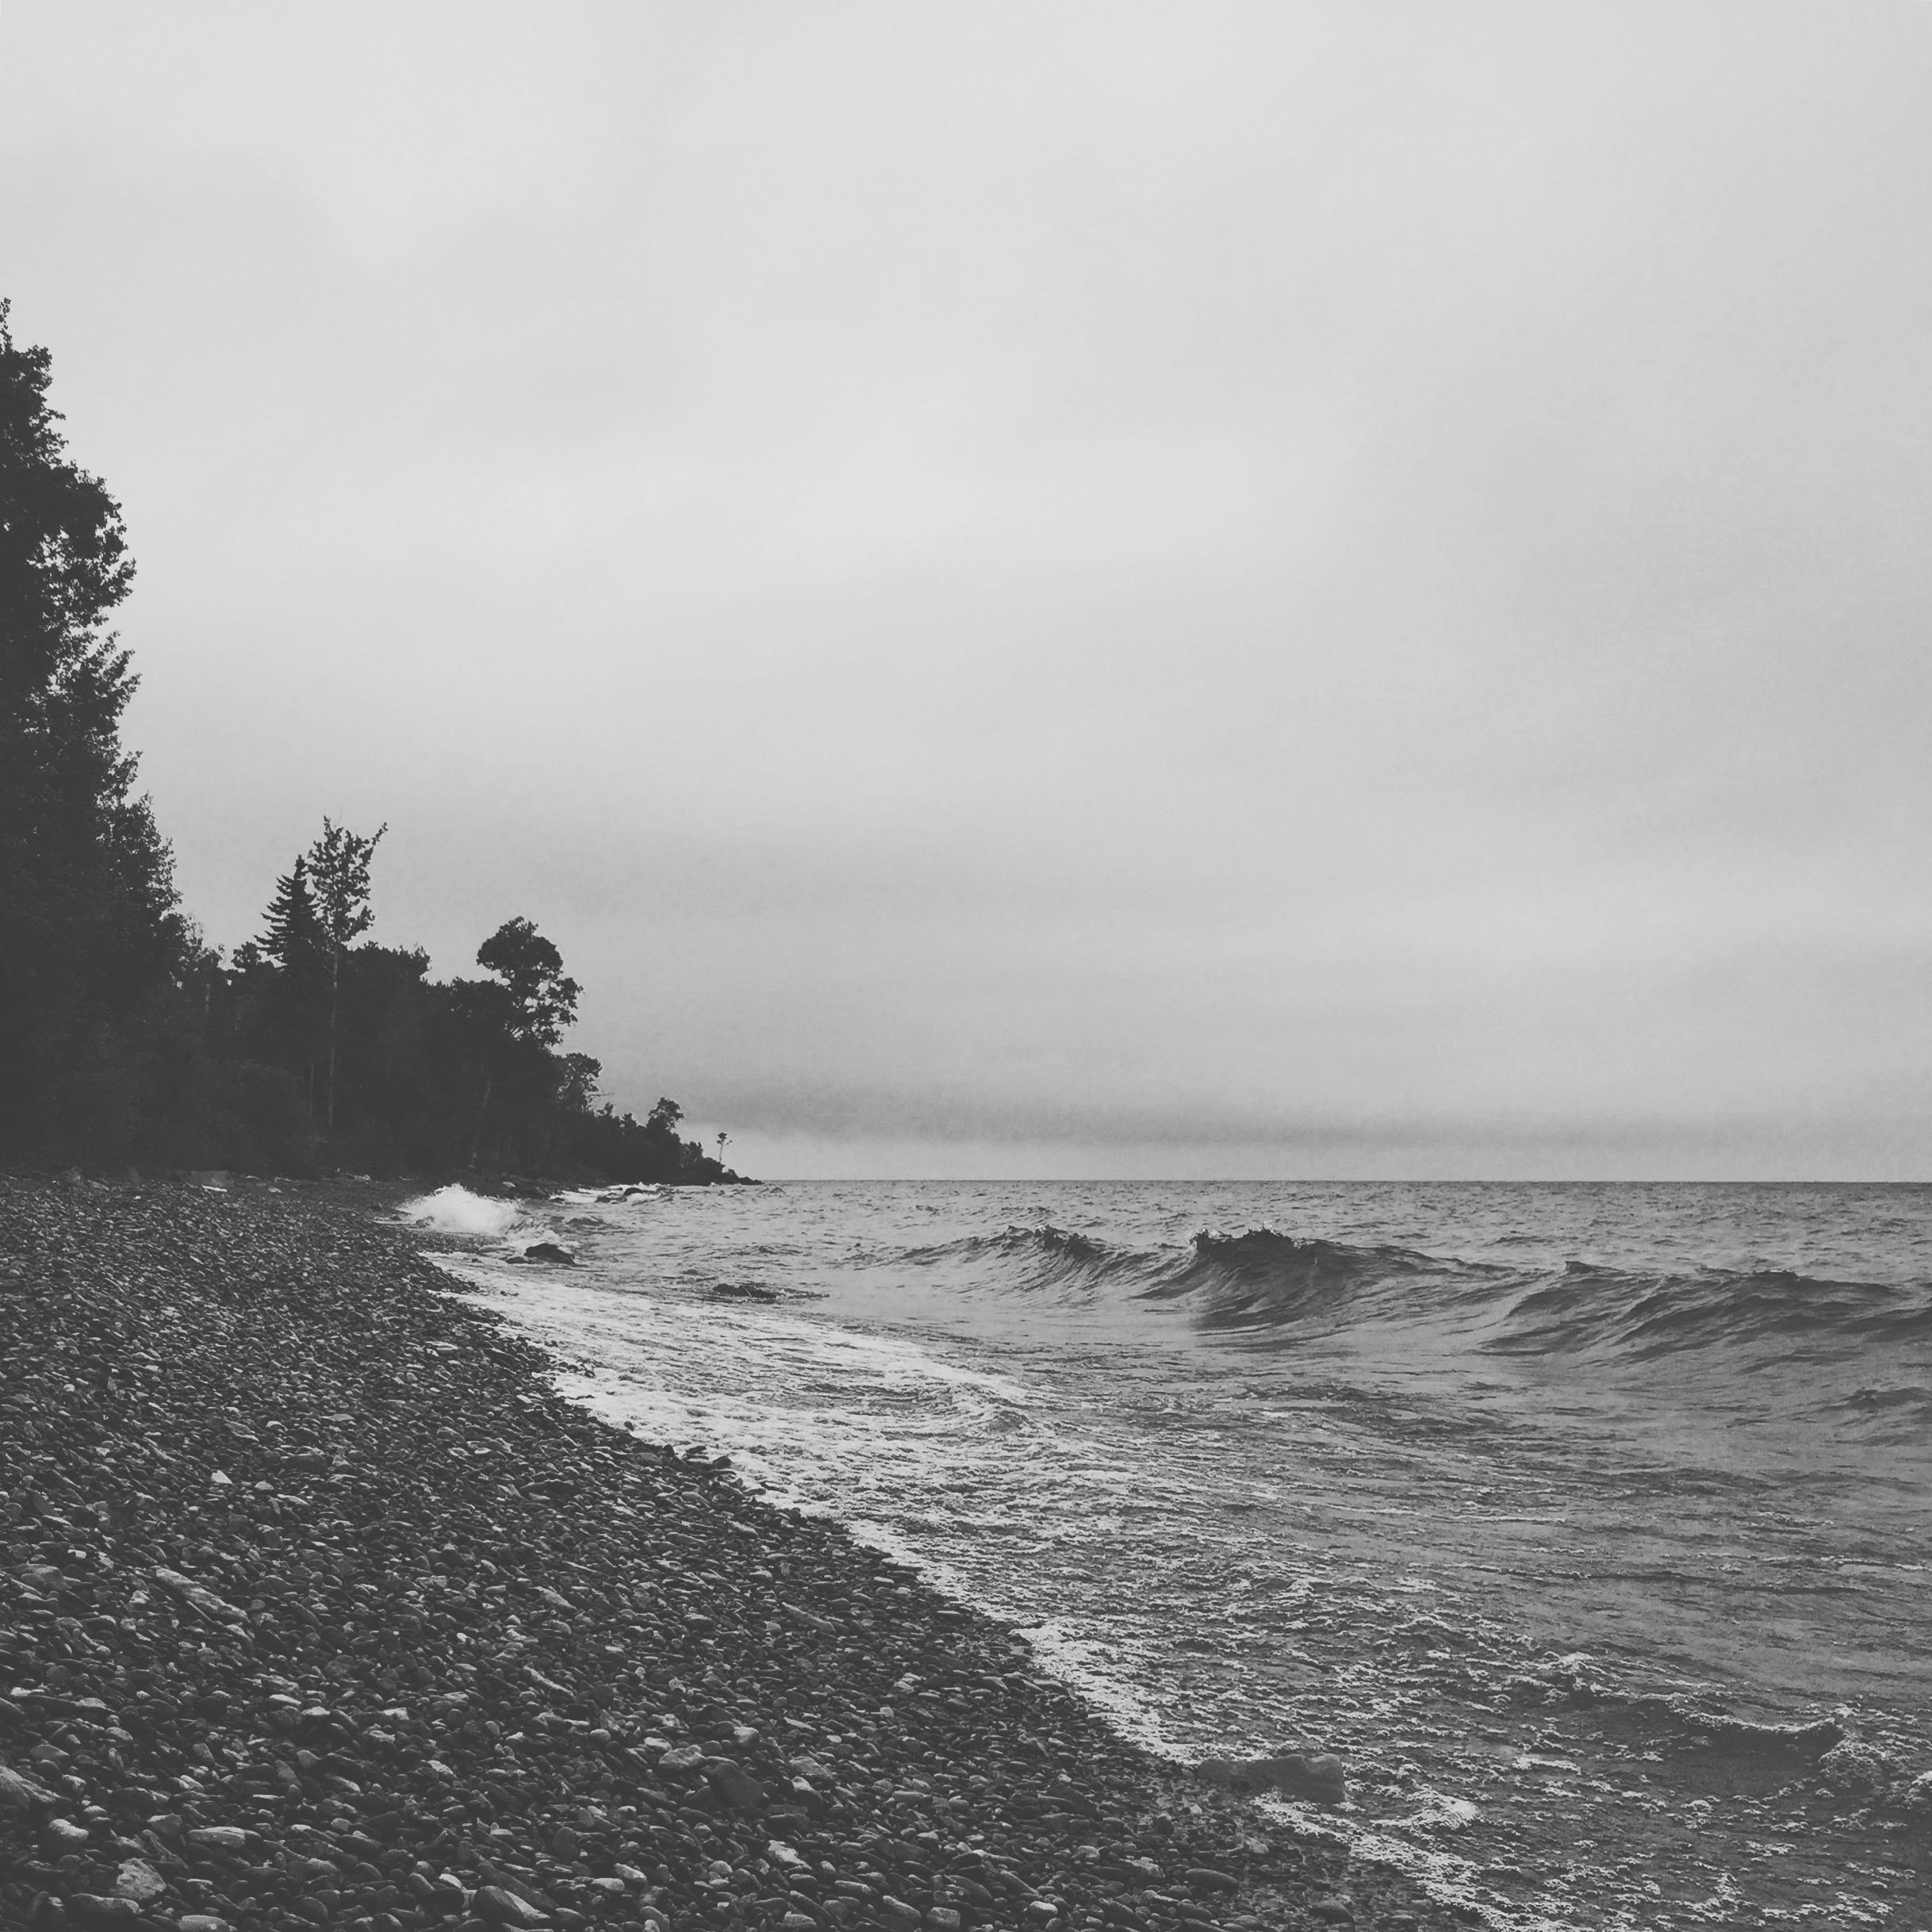 Lake Superior, Minnesota